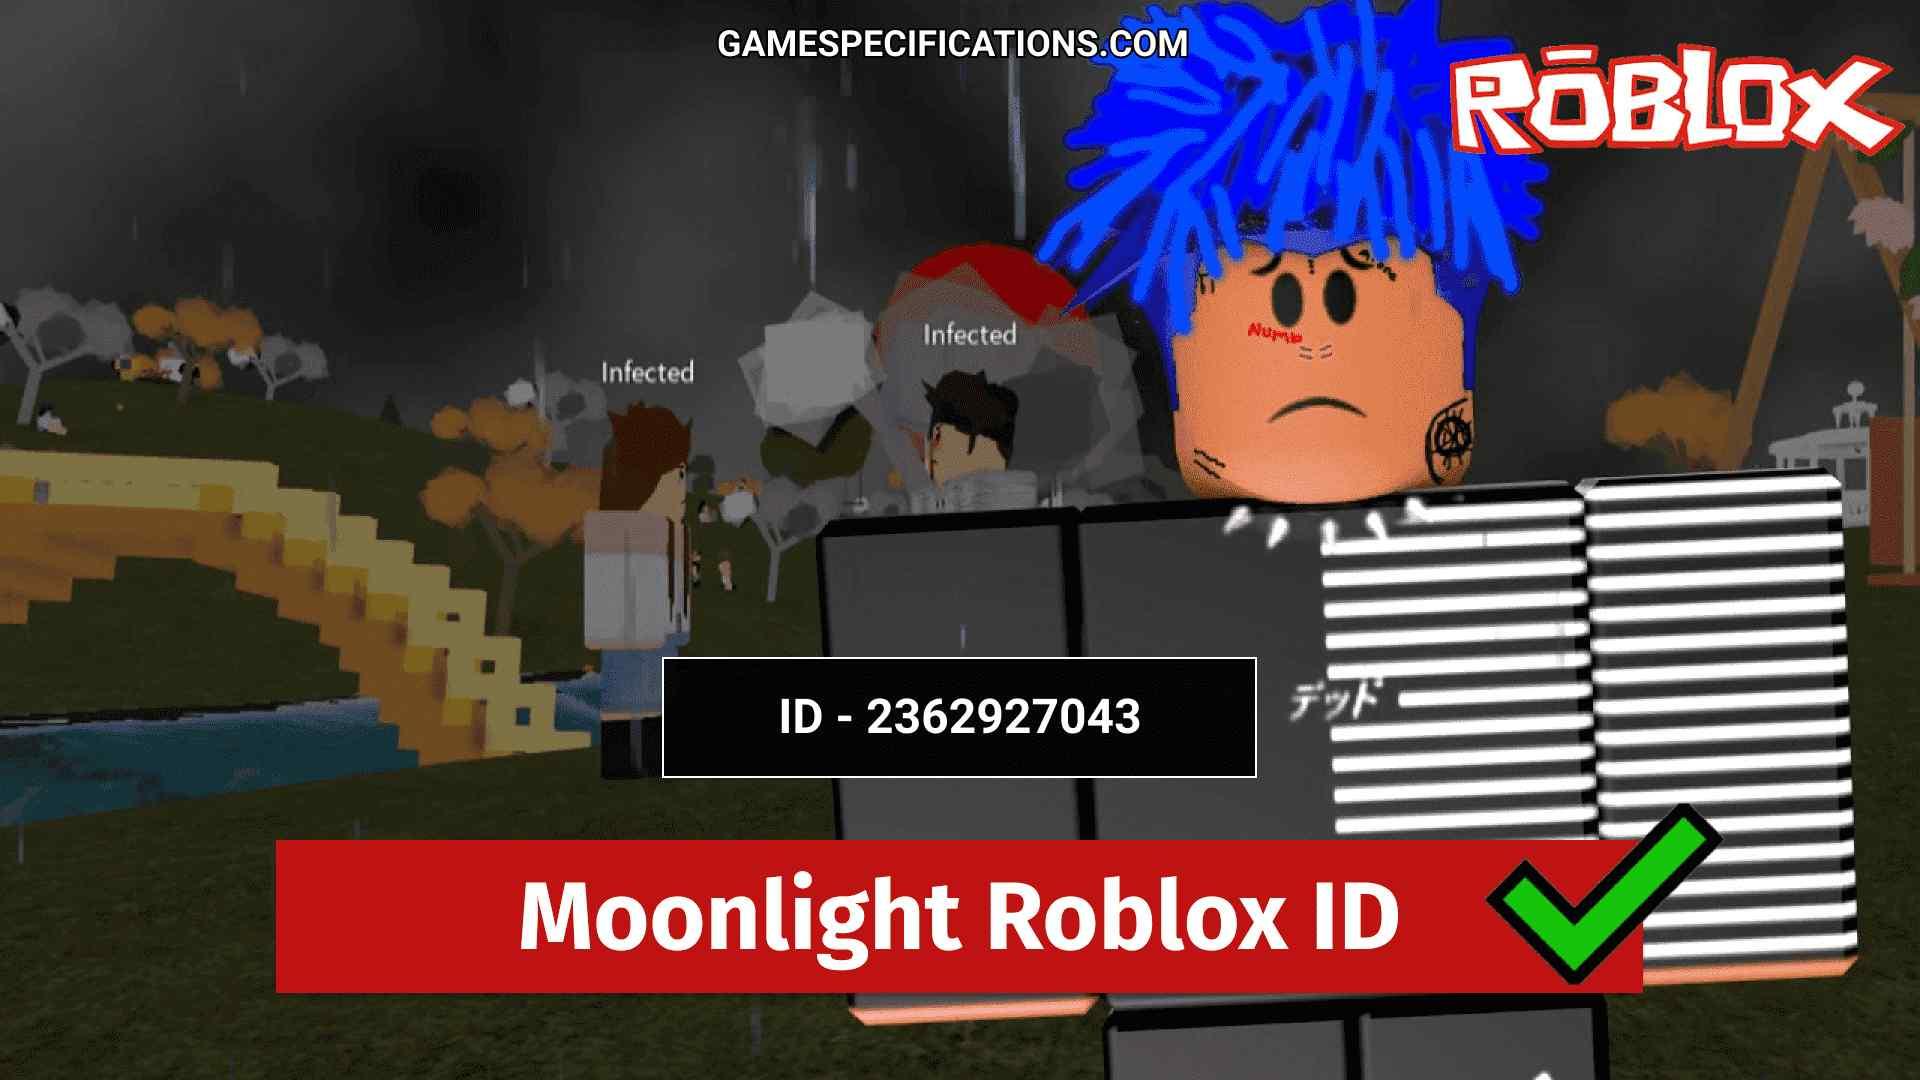 Moonlight Roblox ID Codes